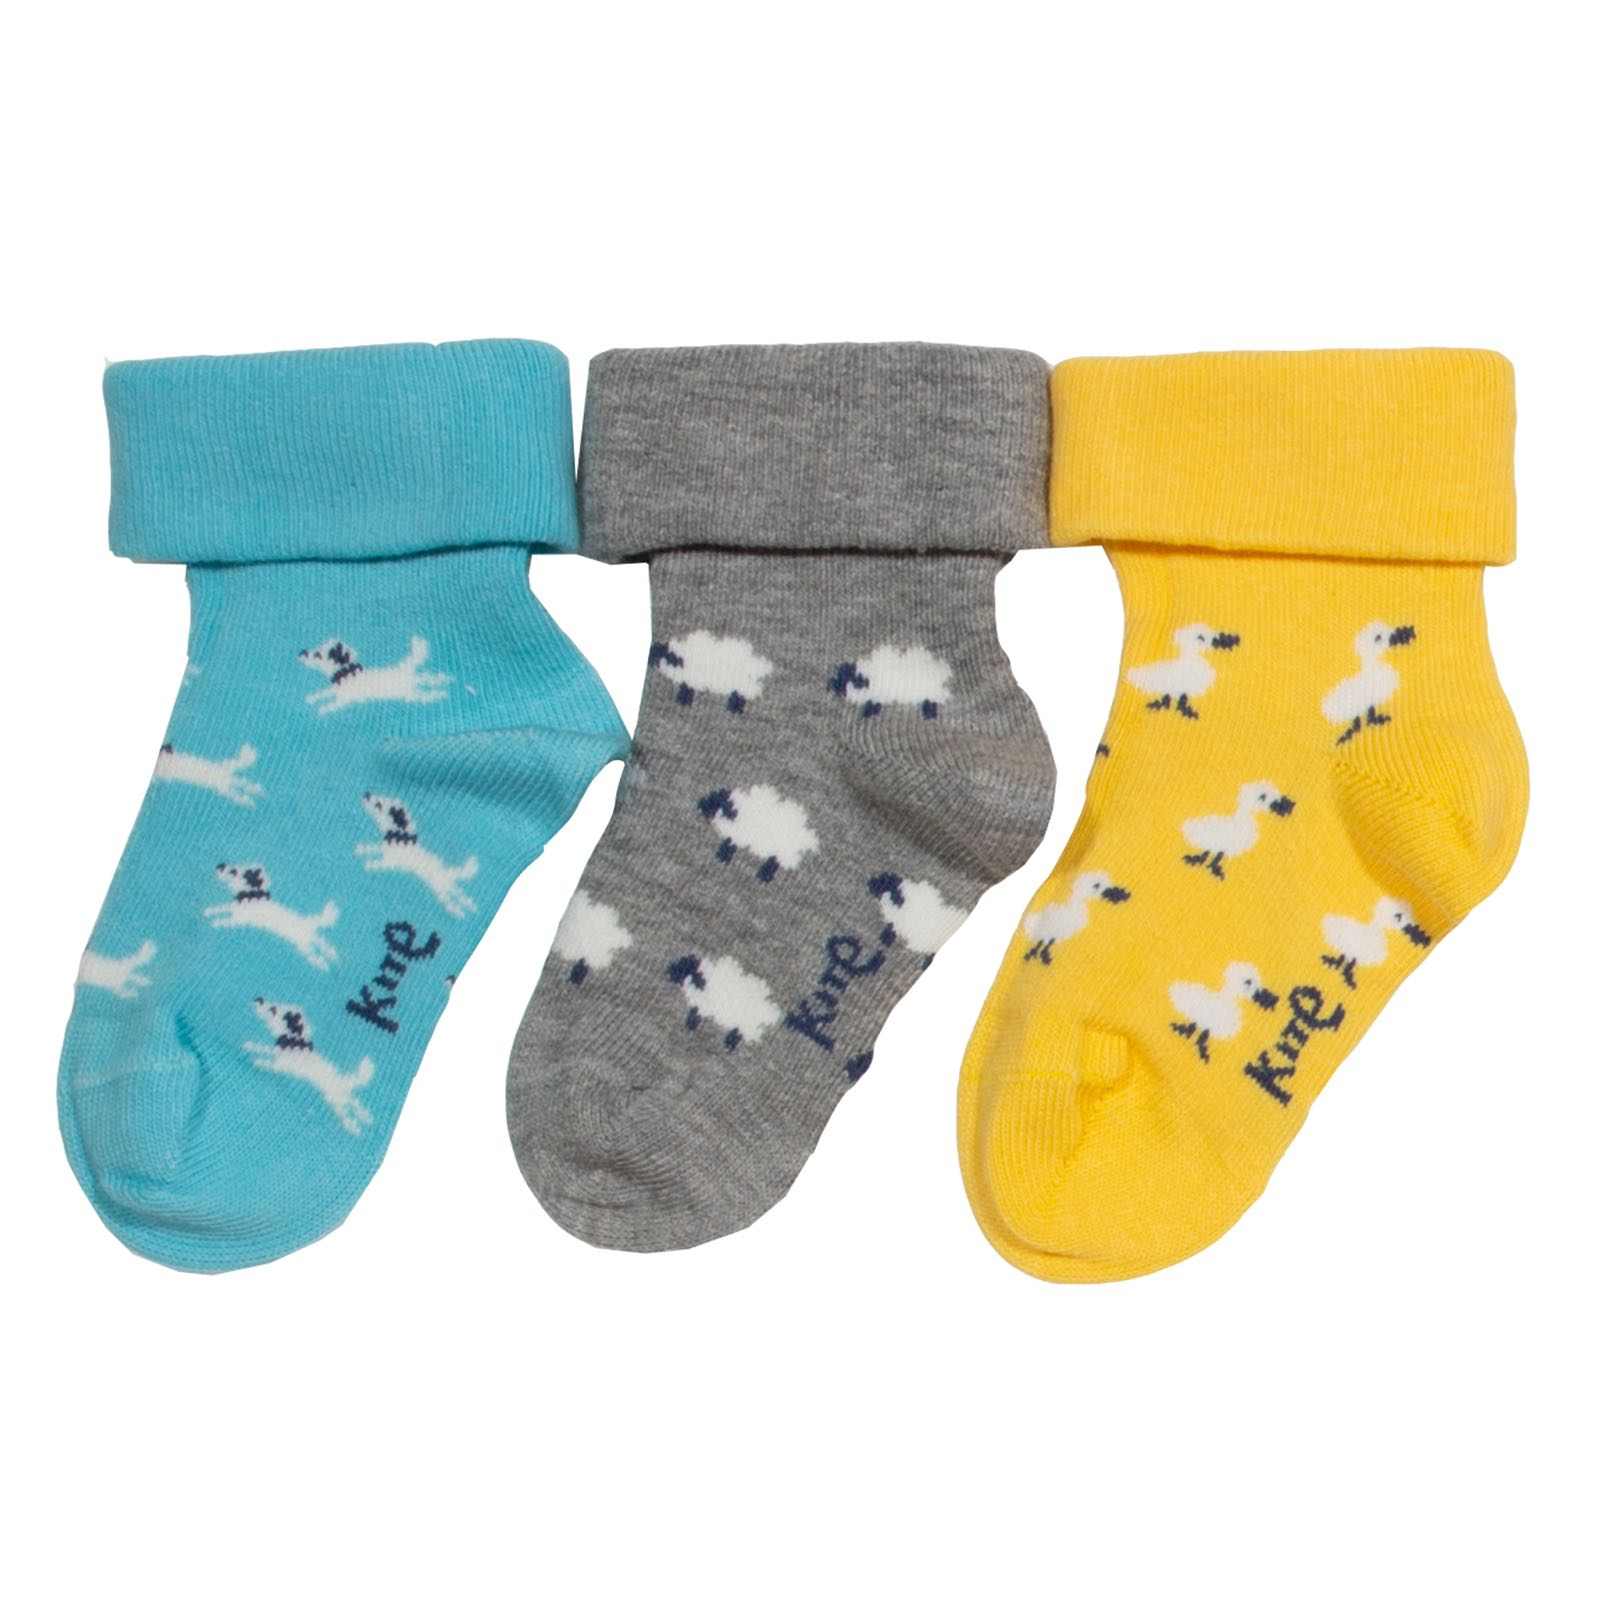 Kite 3pk Farm Garden Socks